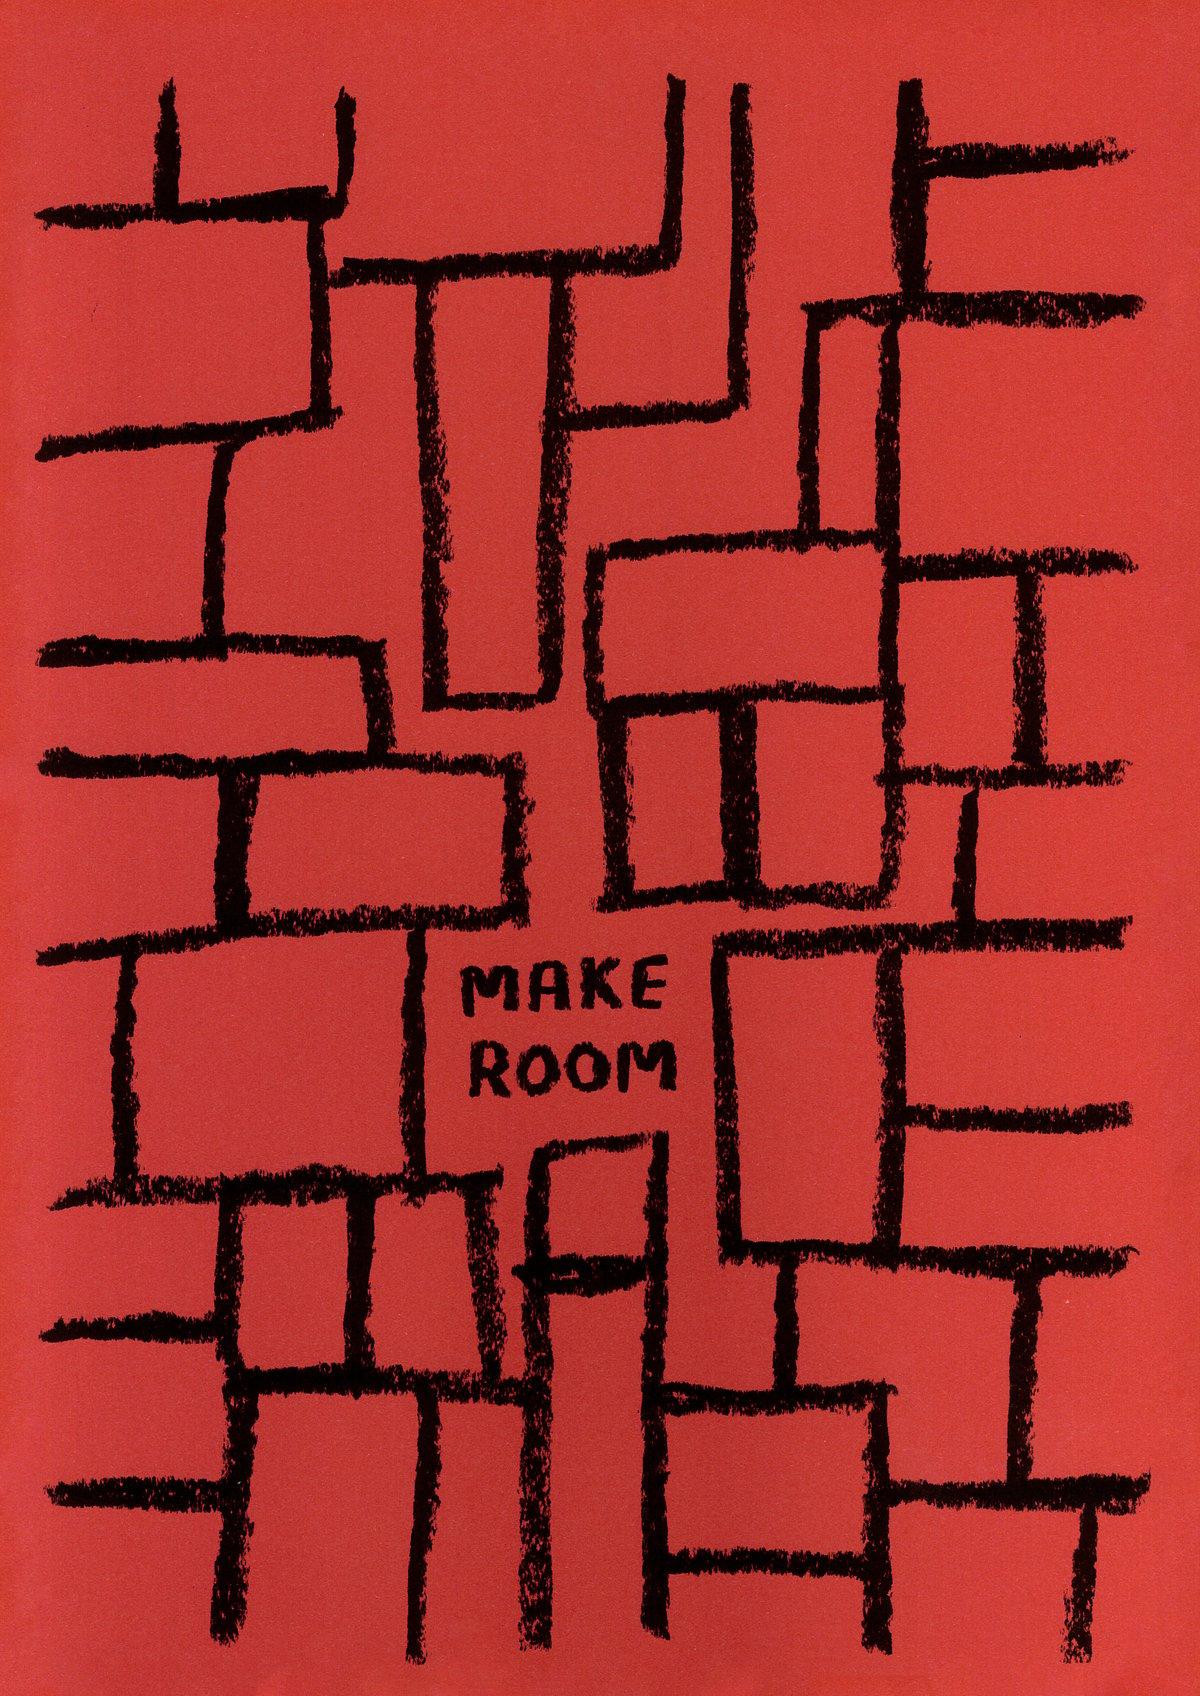 Image of MAKE ROOM